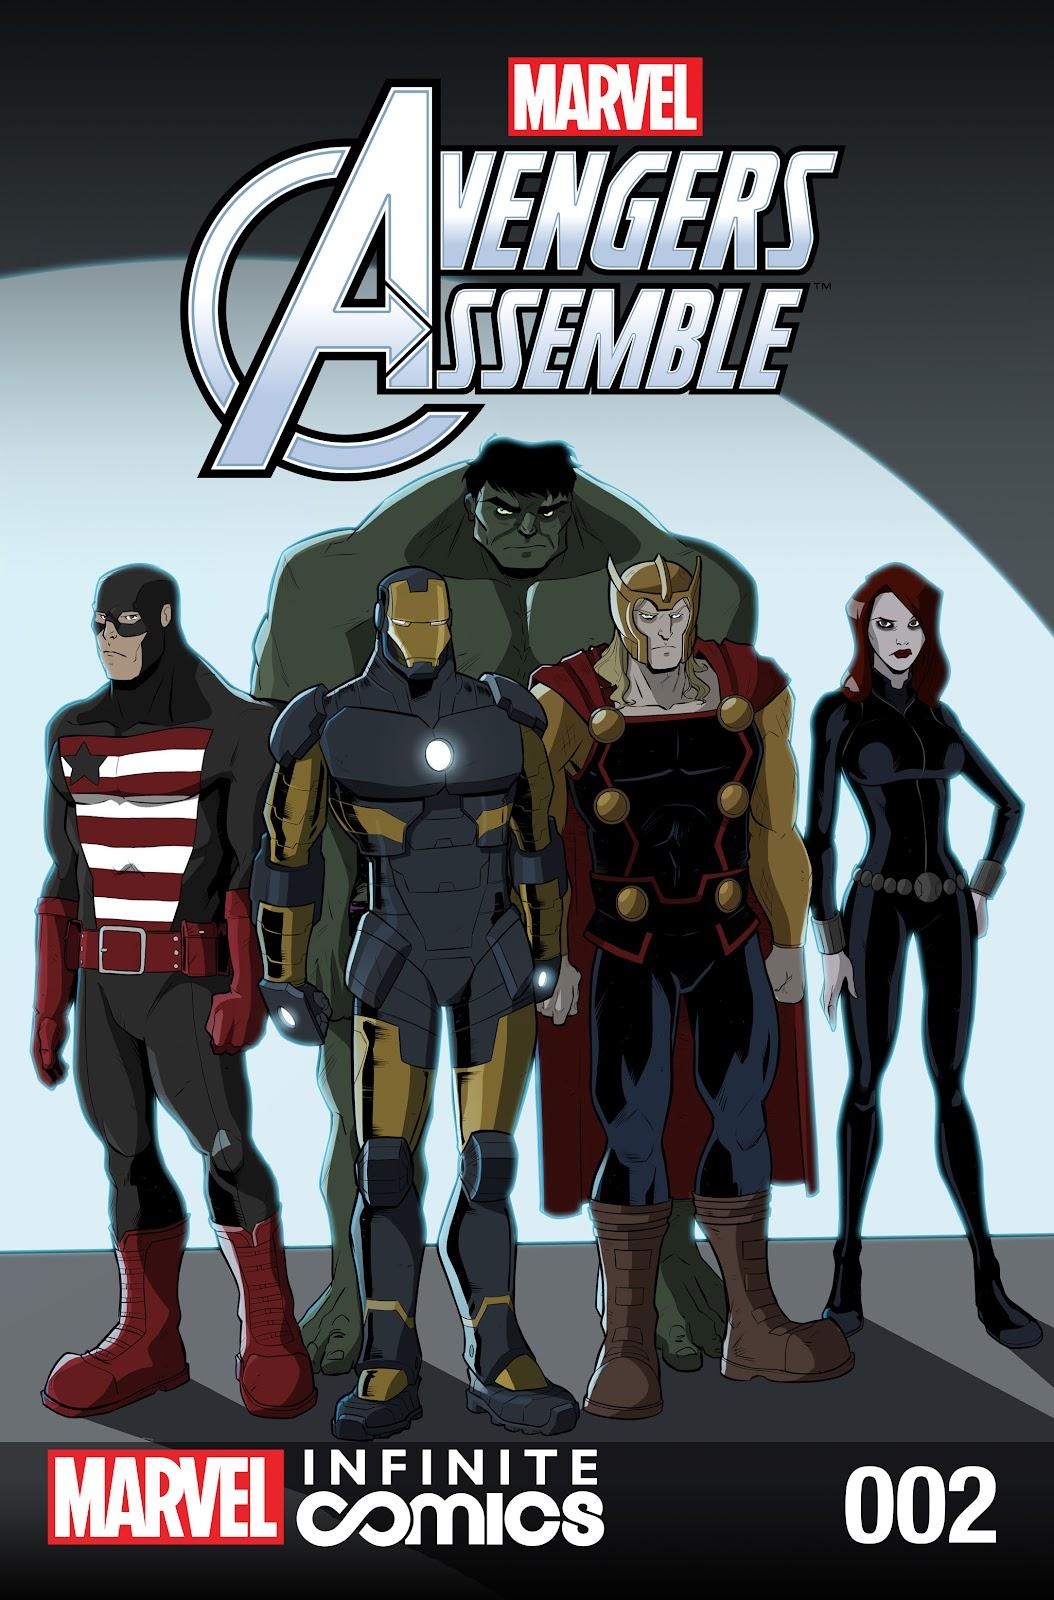 Marvel Universe Avengers Infinite Comic 2 Page 1